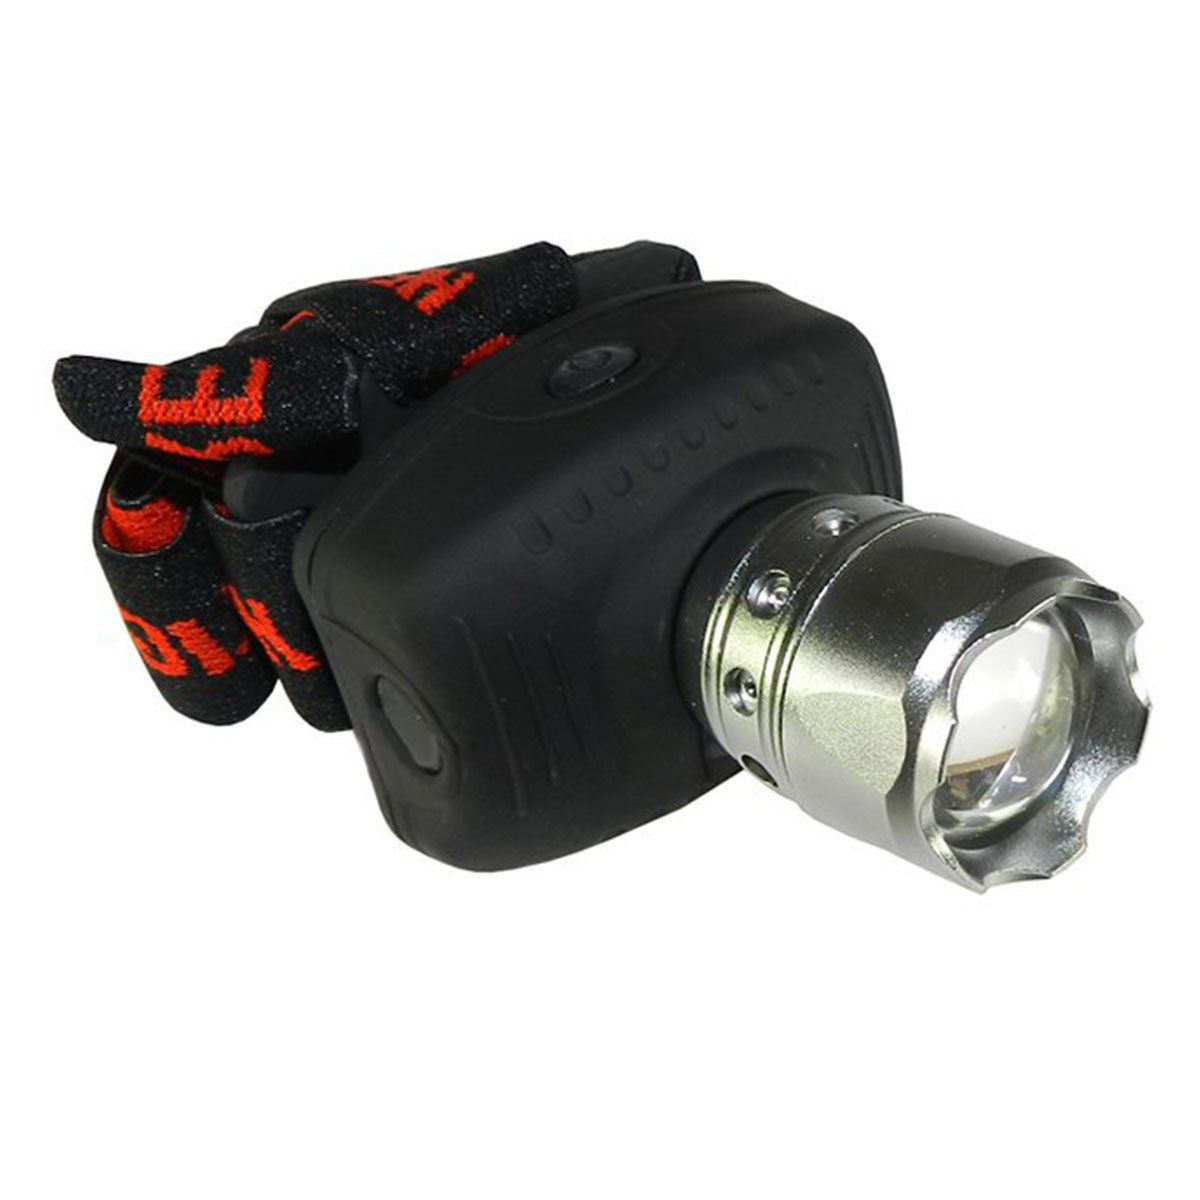 Lanterna Cabeca Ala Albatroz 09 3 Pilhas AAA